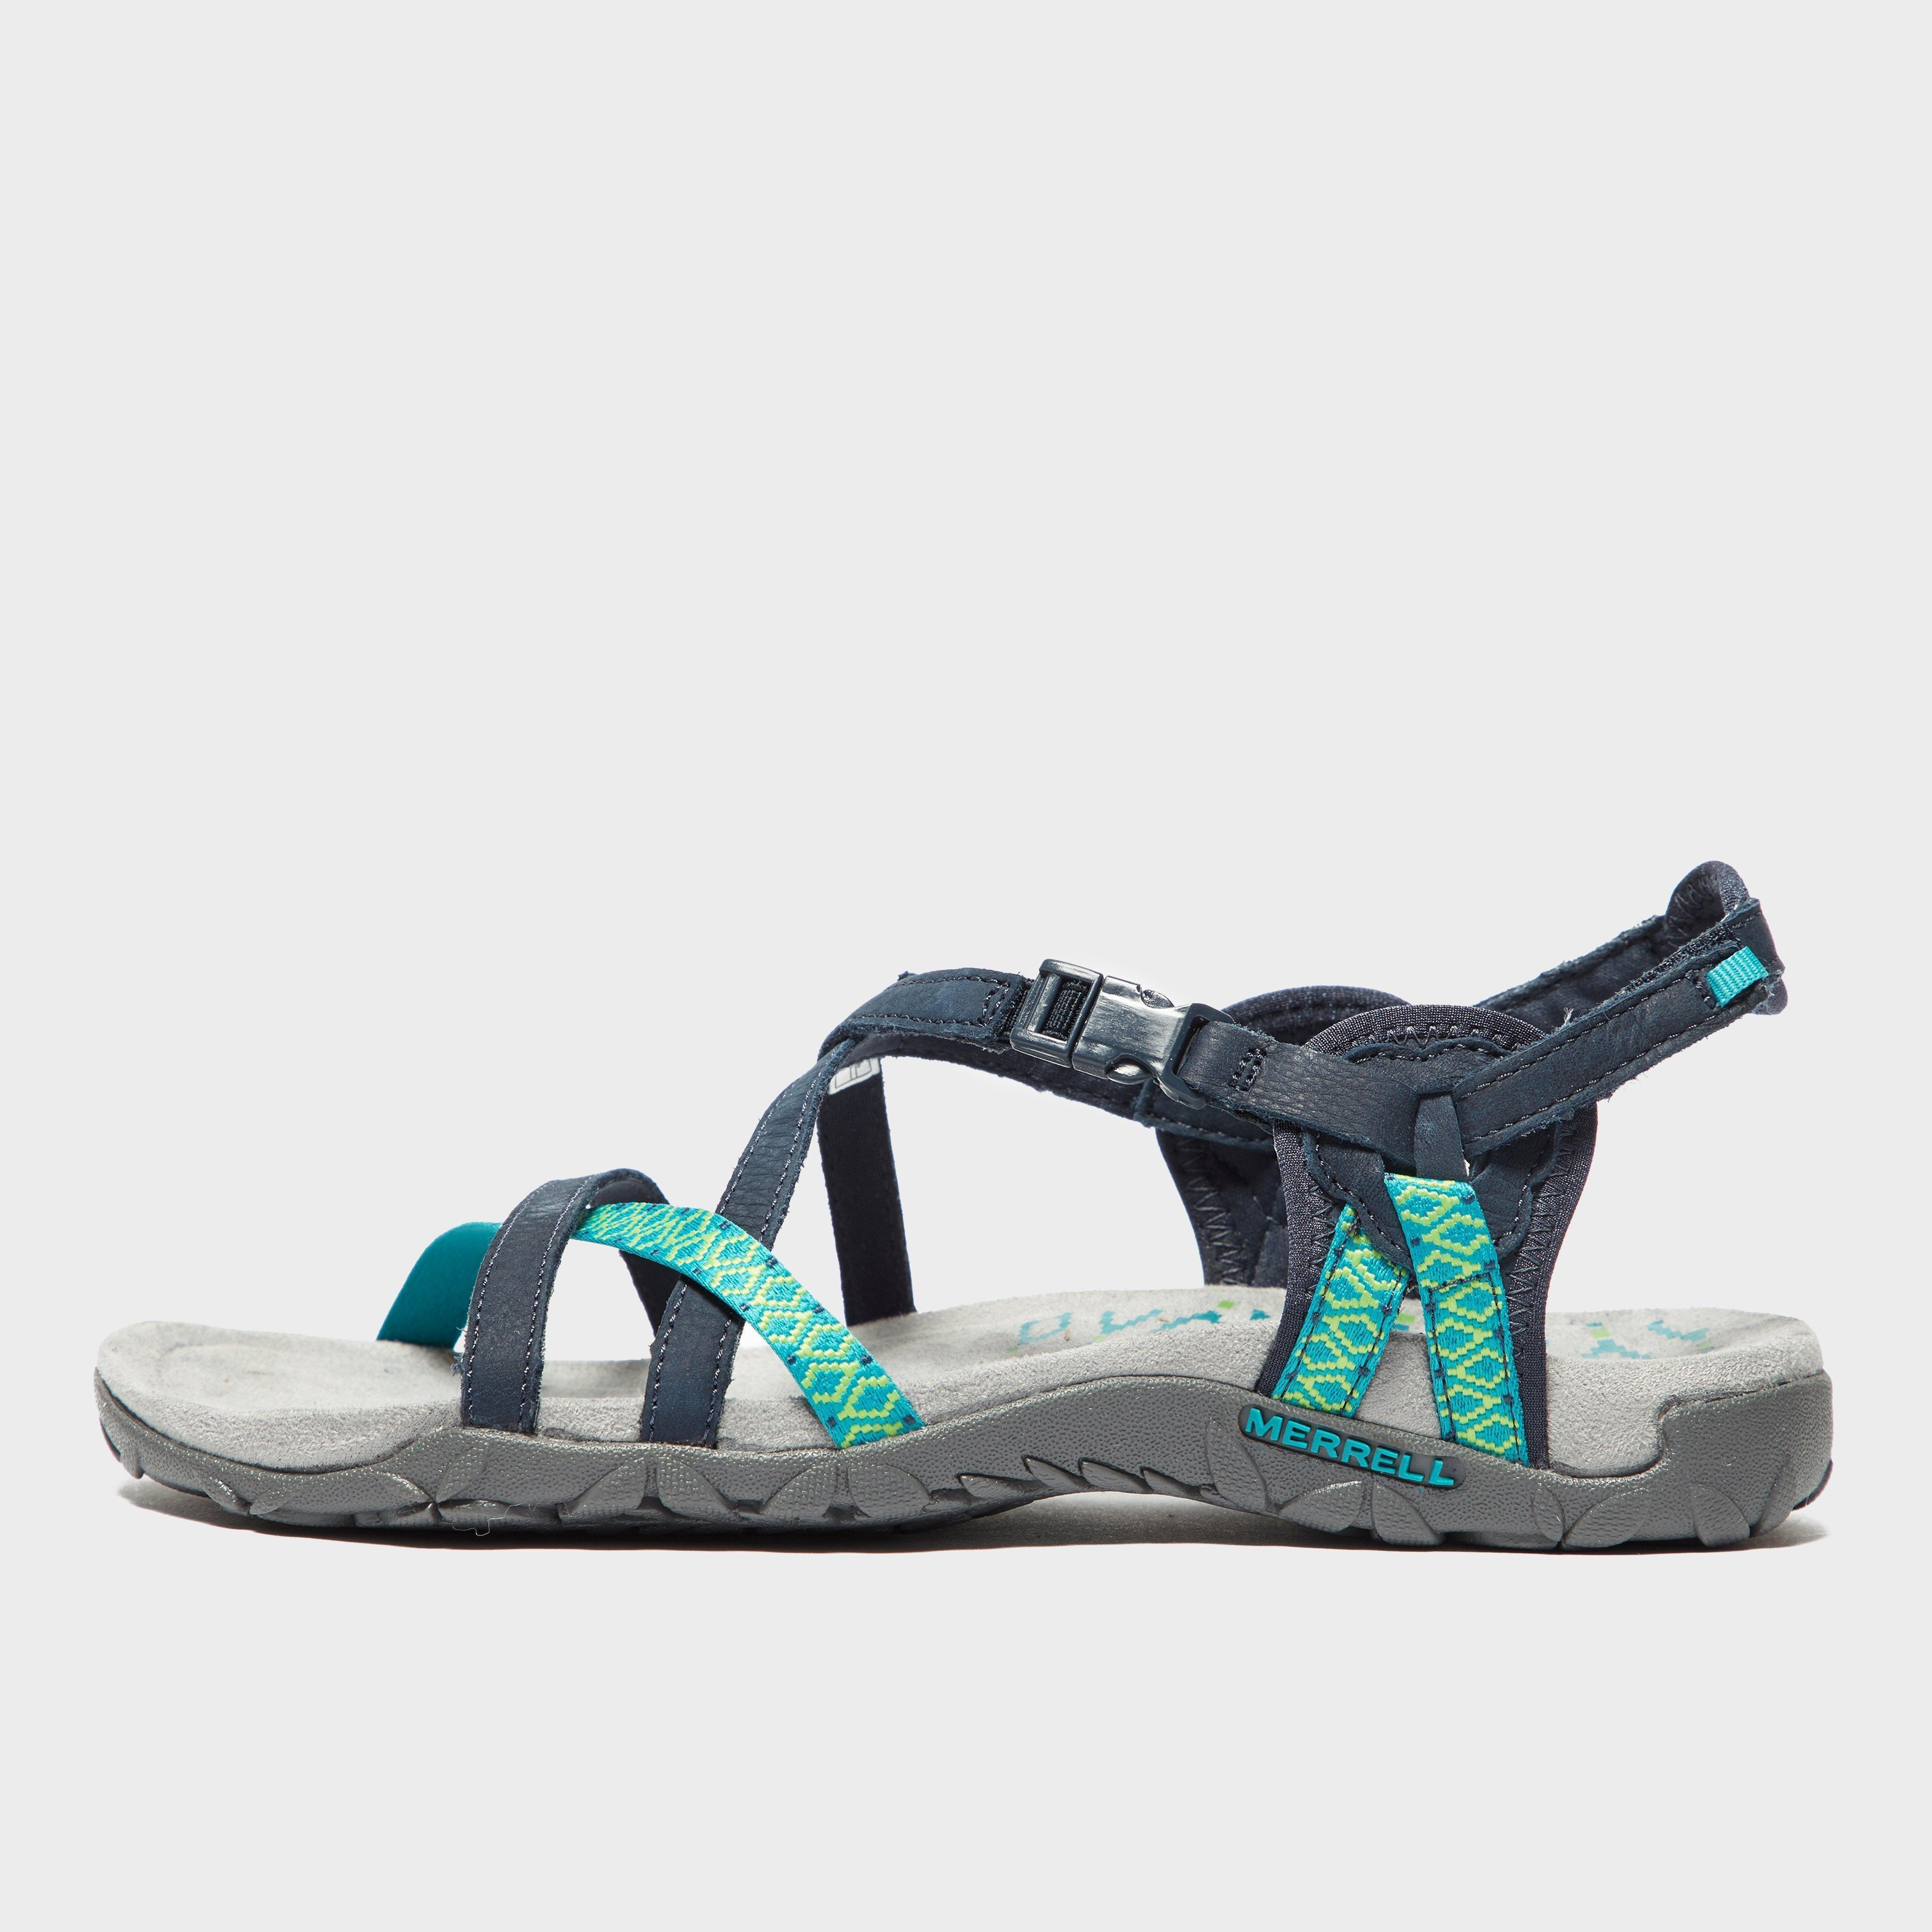 Black sandals uk - Merrell Siena Black Sandals Uk Merrell Siena Black Sandals Uk